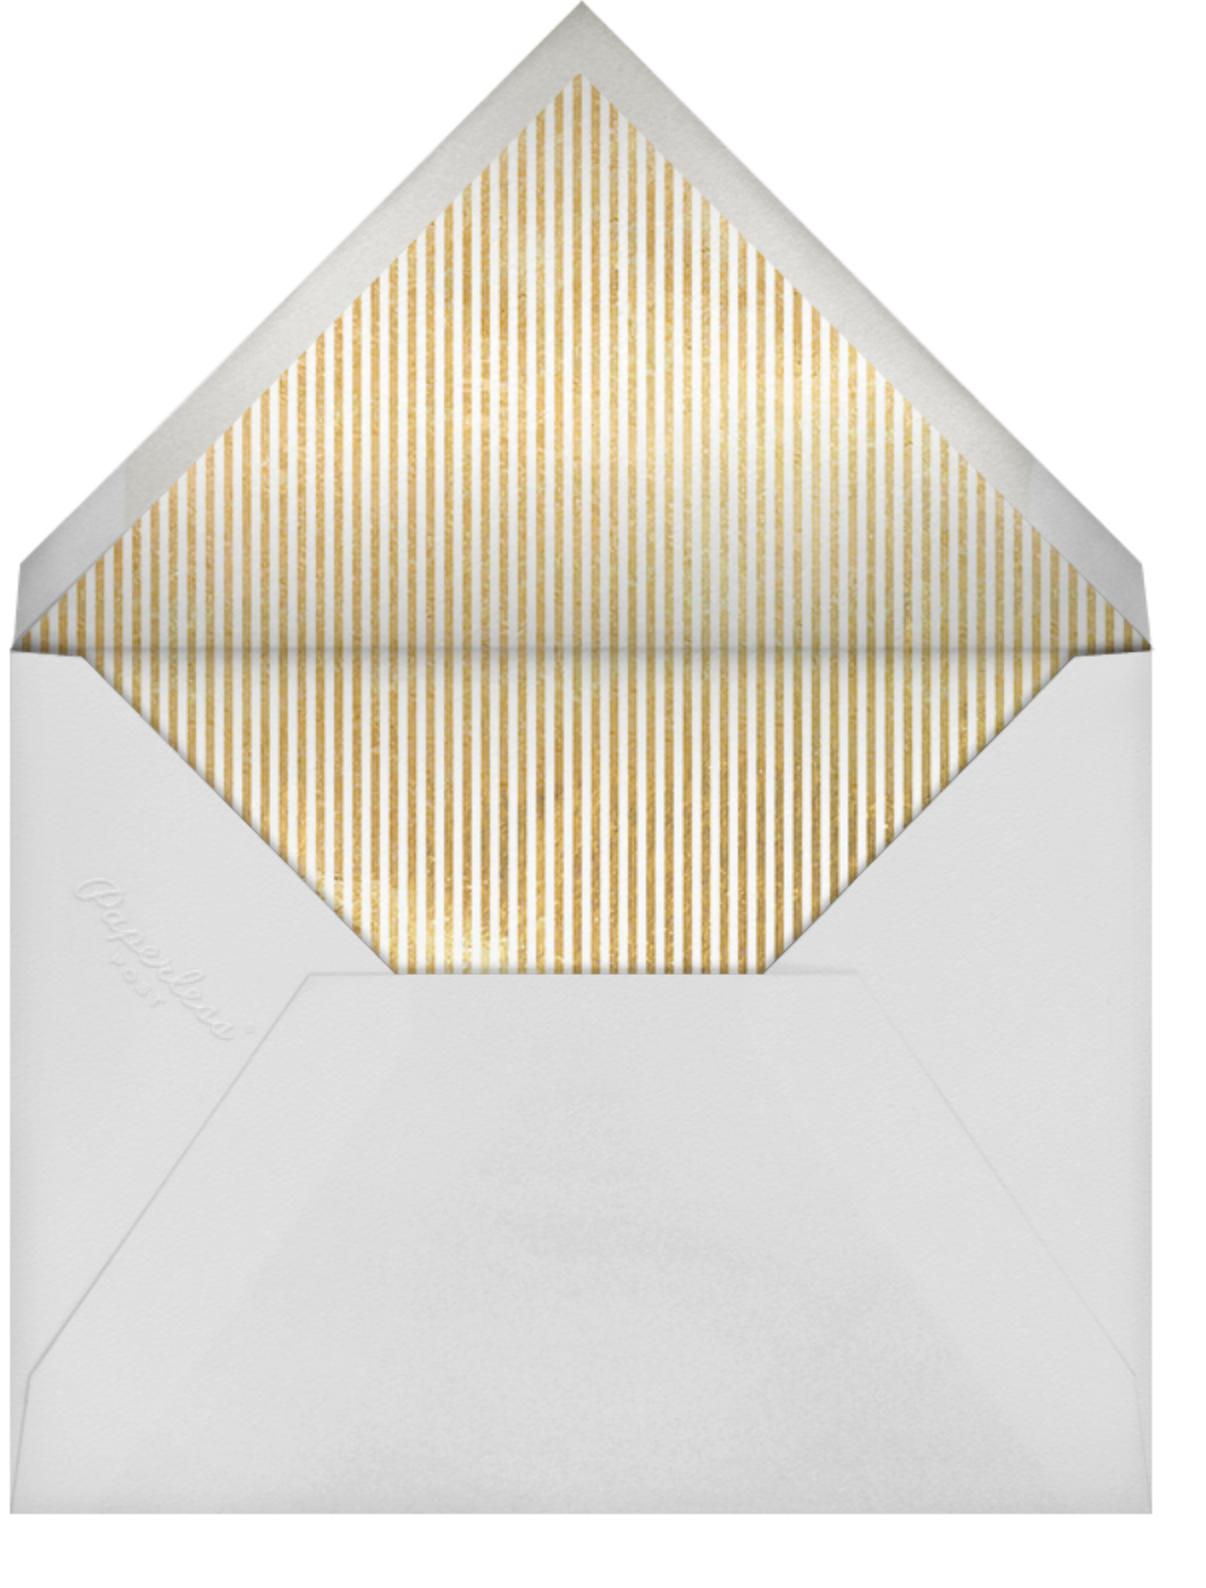 Milestone Dots (Eighty) - Navy - Sugar Paper - Adult birthday - envelope back